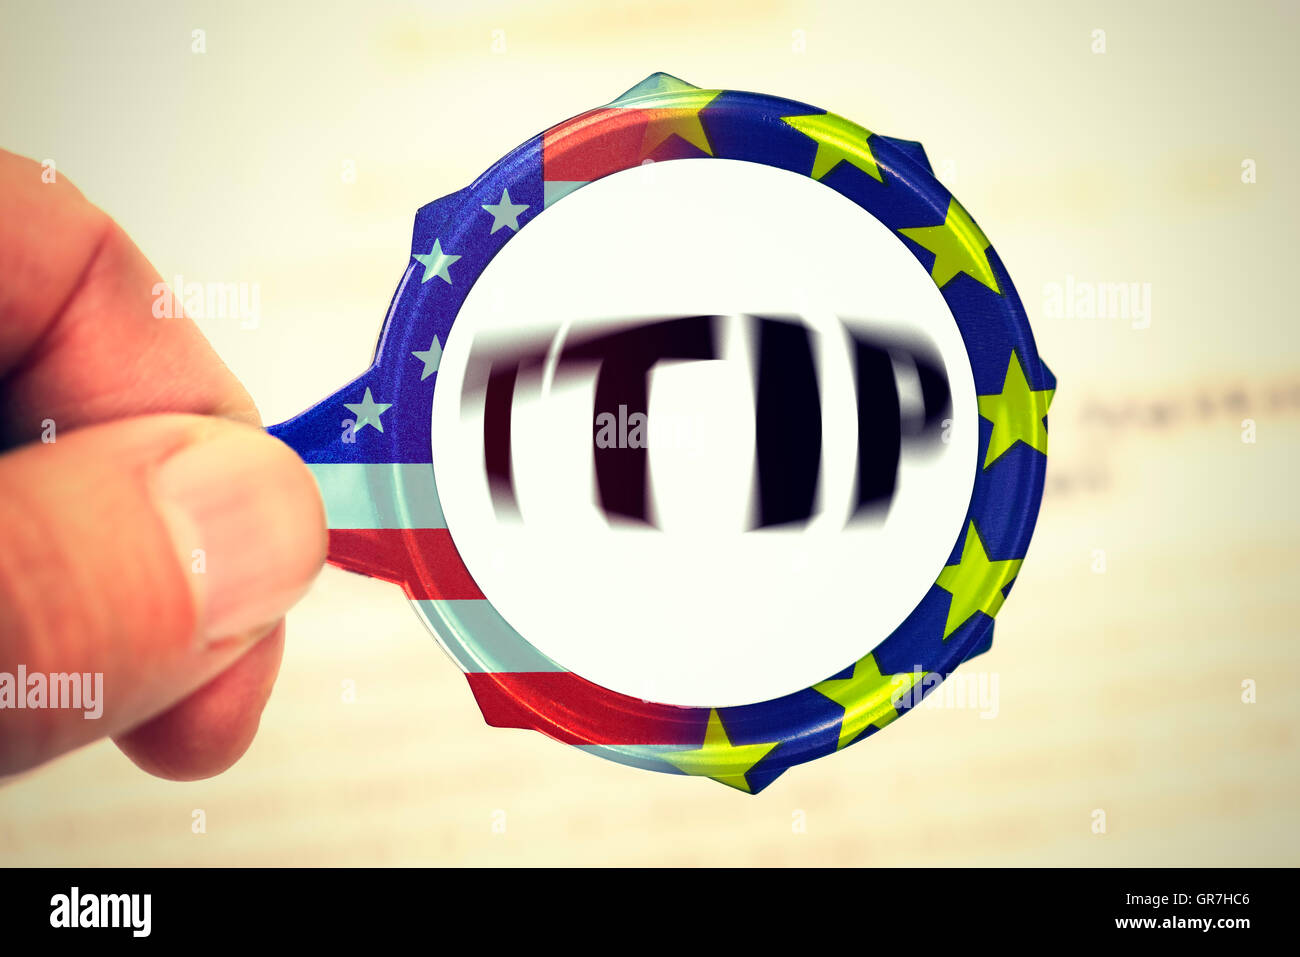 Transatlantic Free Trade Agreement Stock Photos Transatlantic Free